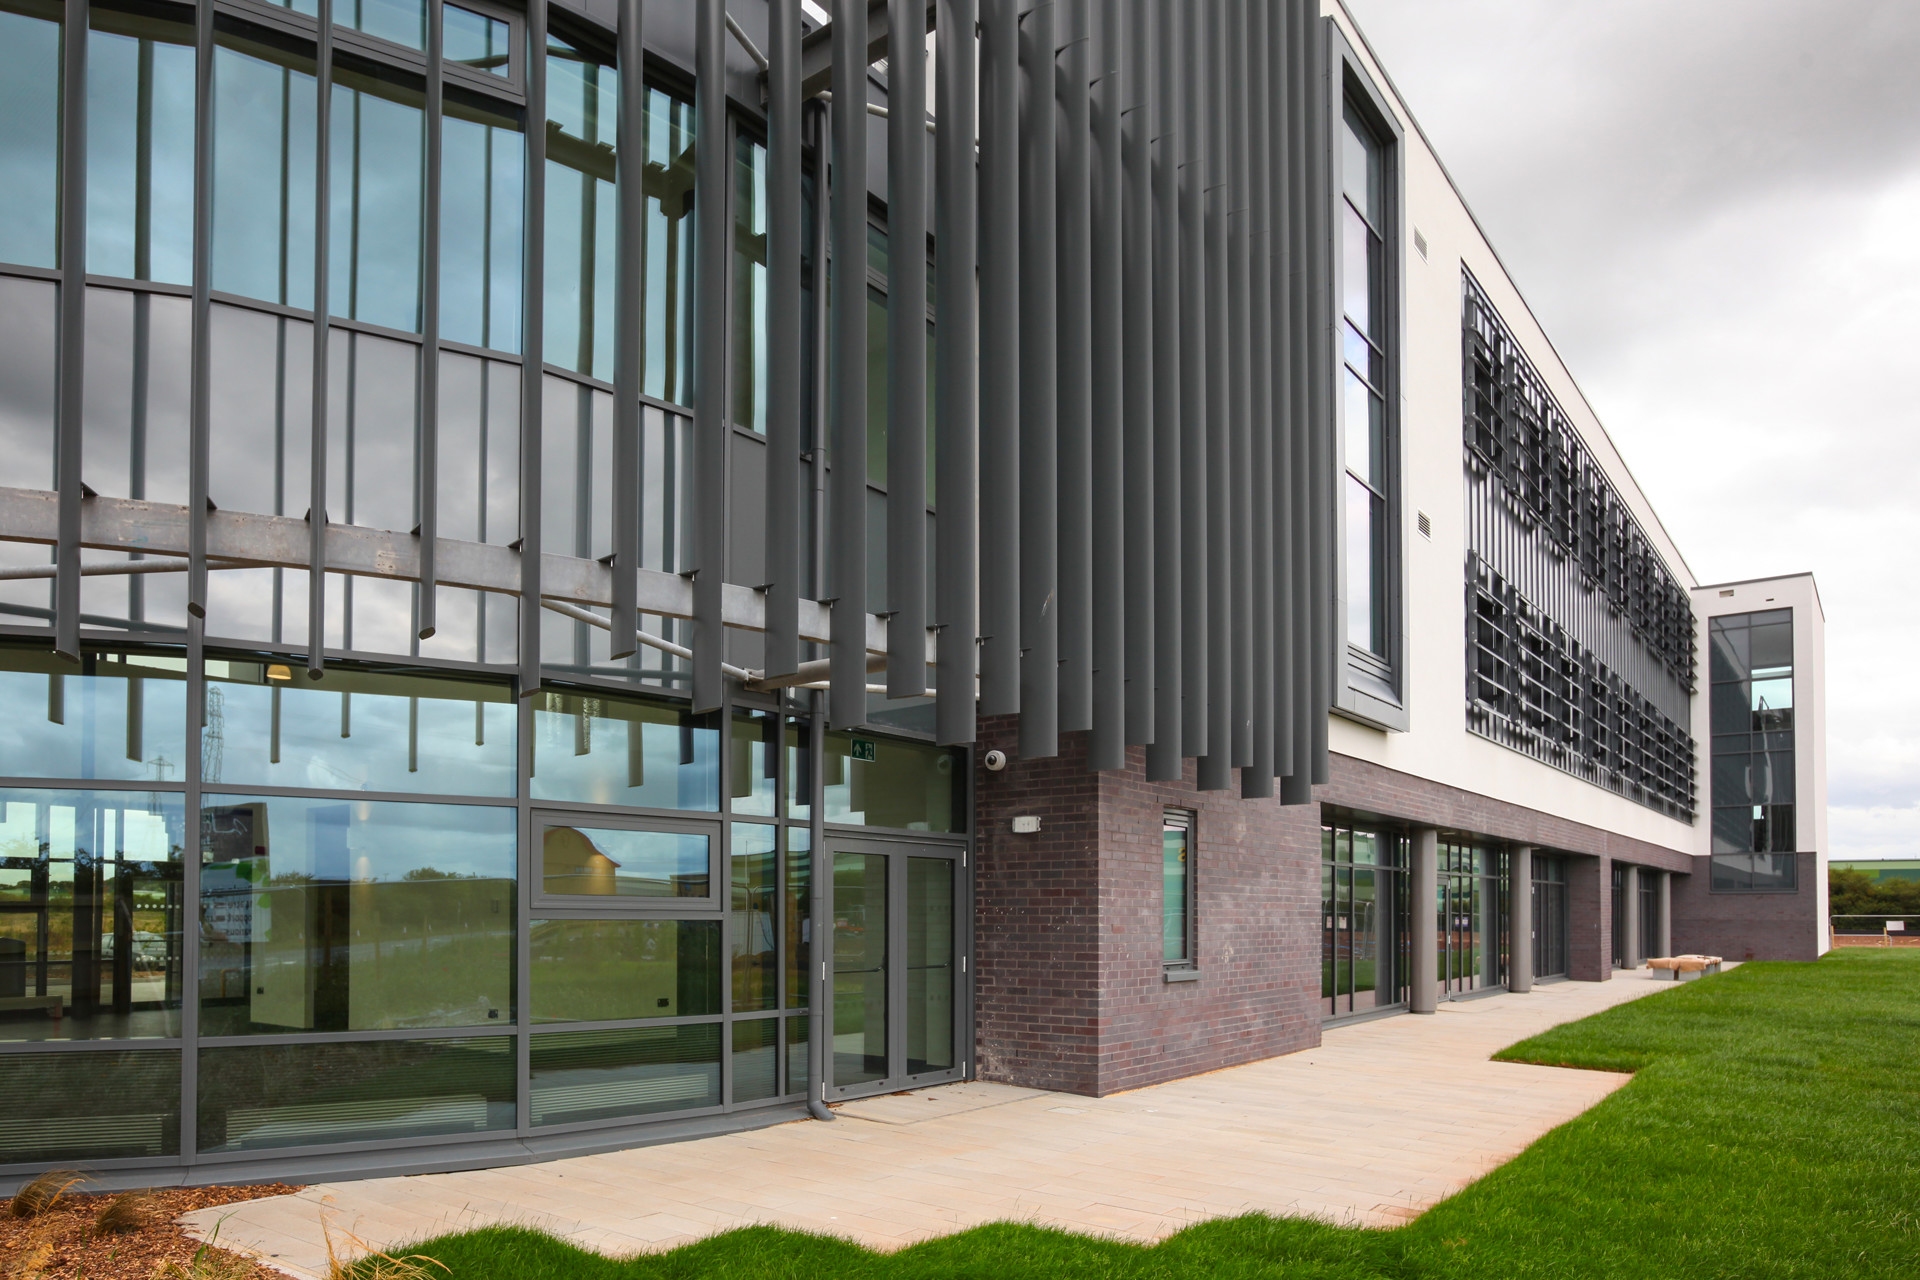 Boosting business and saving energy — Ian Liddell-Grainger